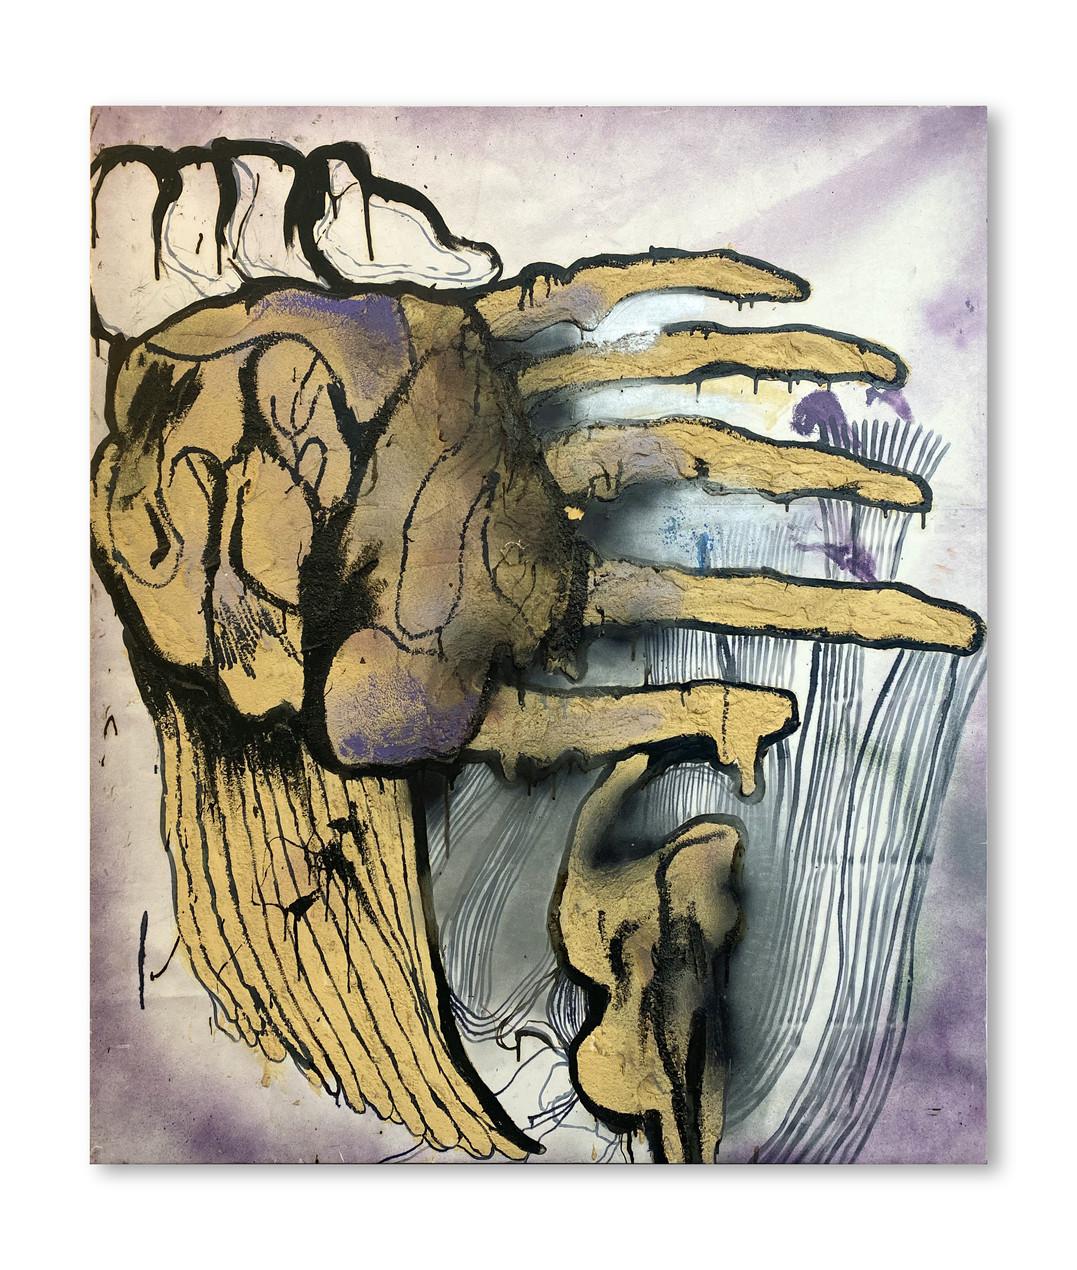 dissezioni_ultra vision (Anatomie-o-esperiment) - Matteo Forli